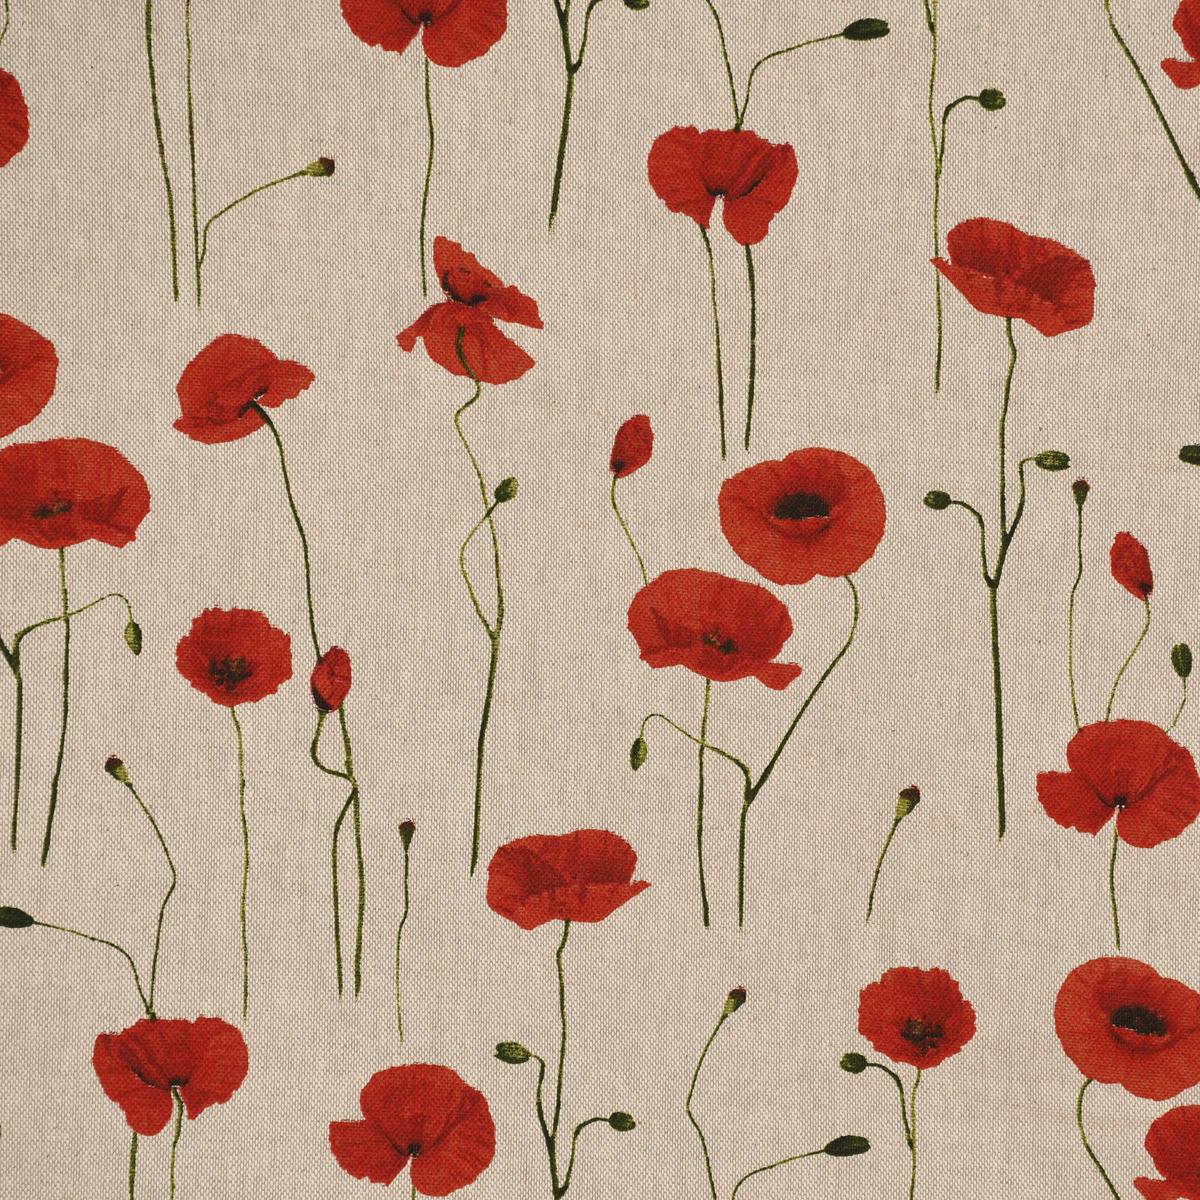 Dekostoff Halbpanama Leinenlook Poppy Field Mohnblumen natur rot 1,40m Breite